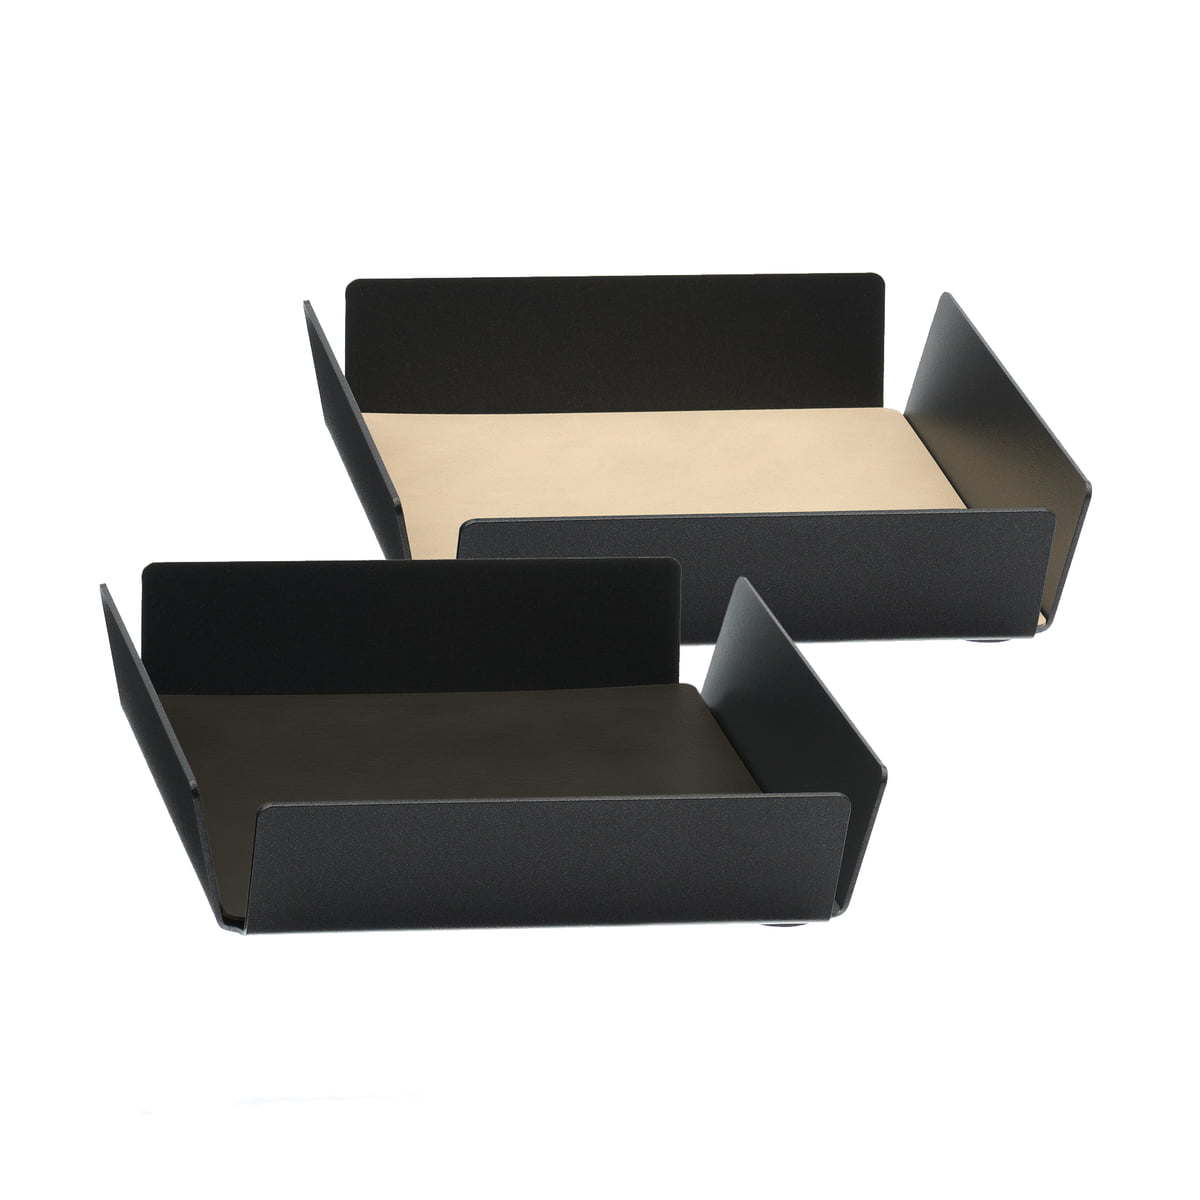 Mini Tablett Square von LindDNA   Connox Shop